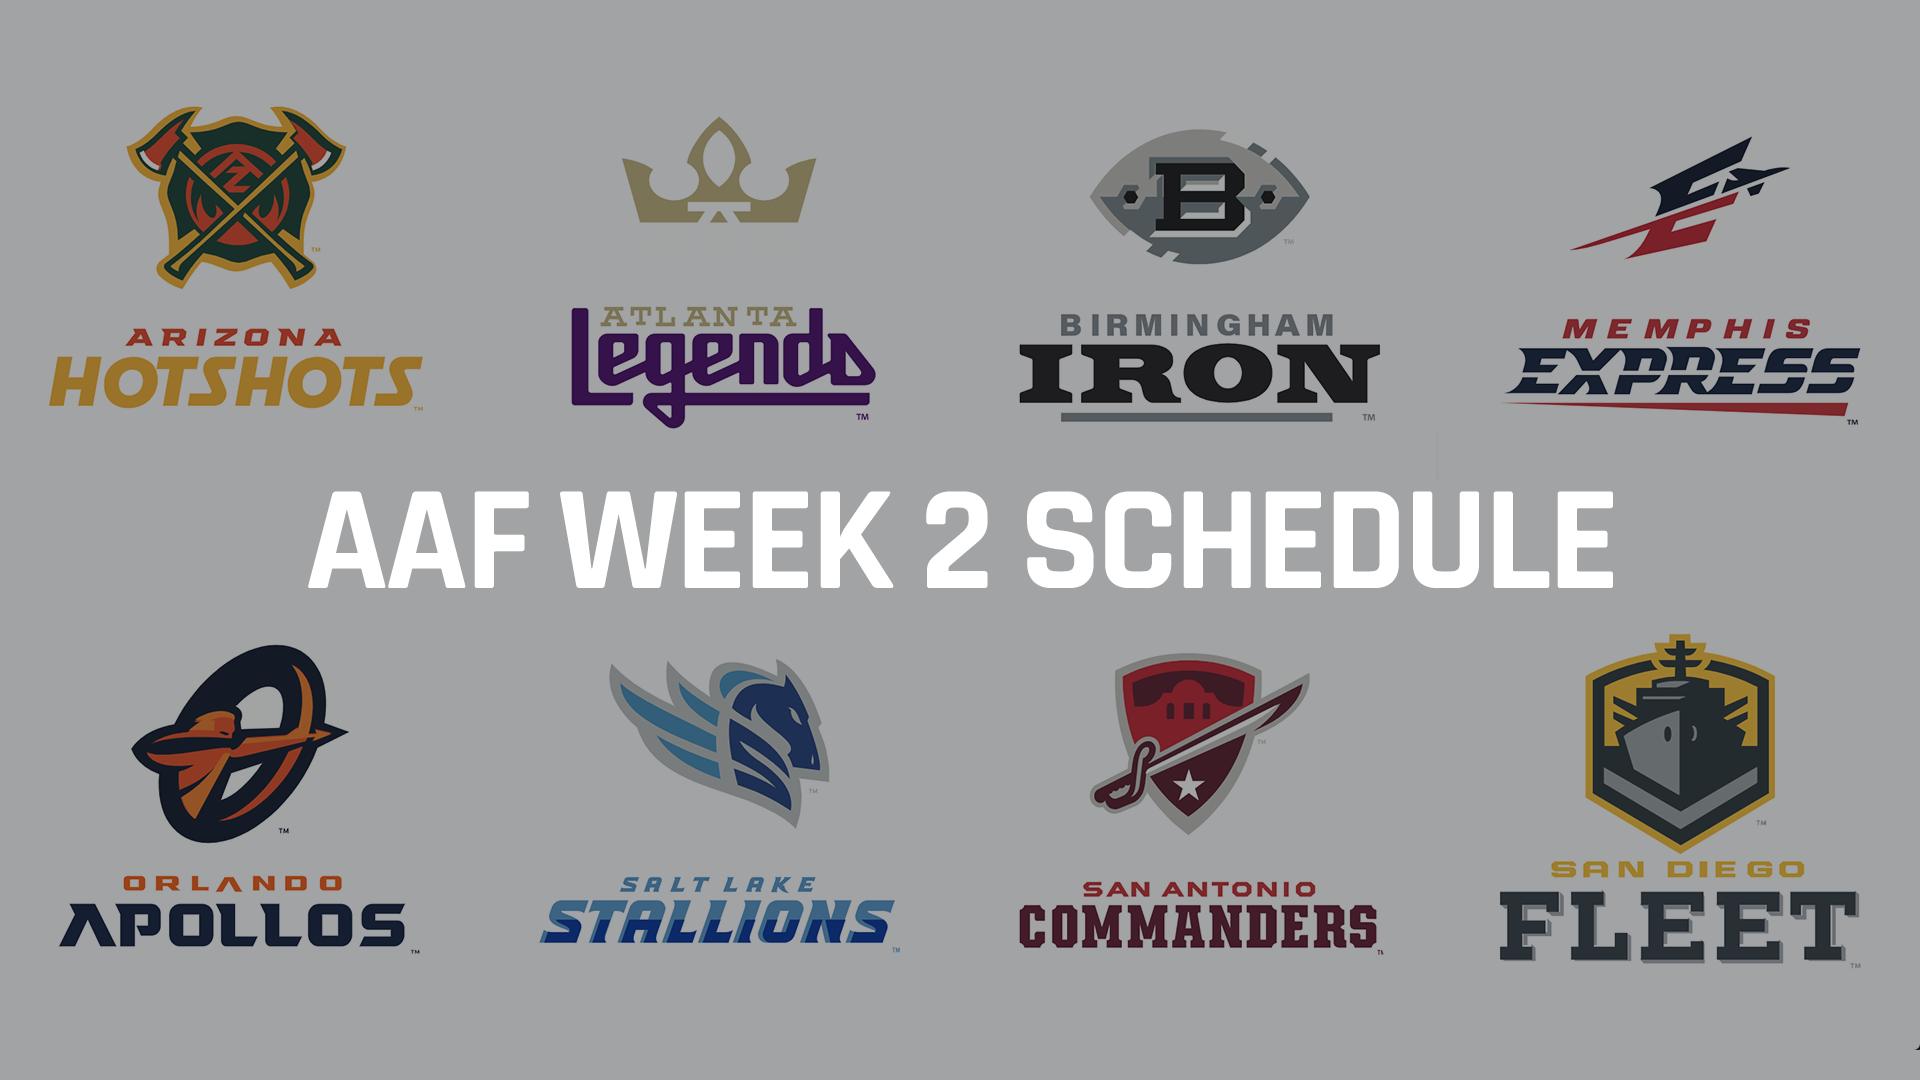 Aaf-week-2-schedule-ftr_oq53qnwn3ylq10mkf7eec8j6q